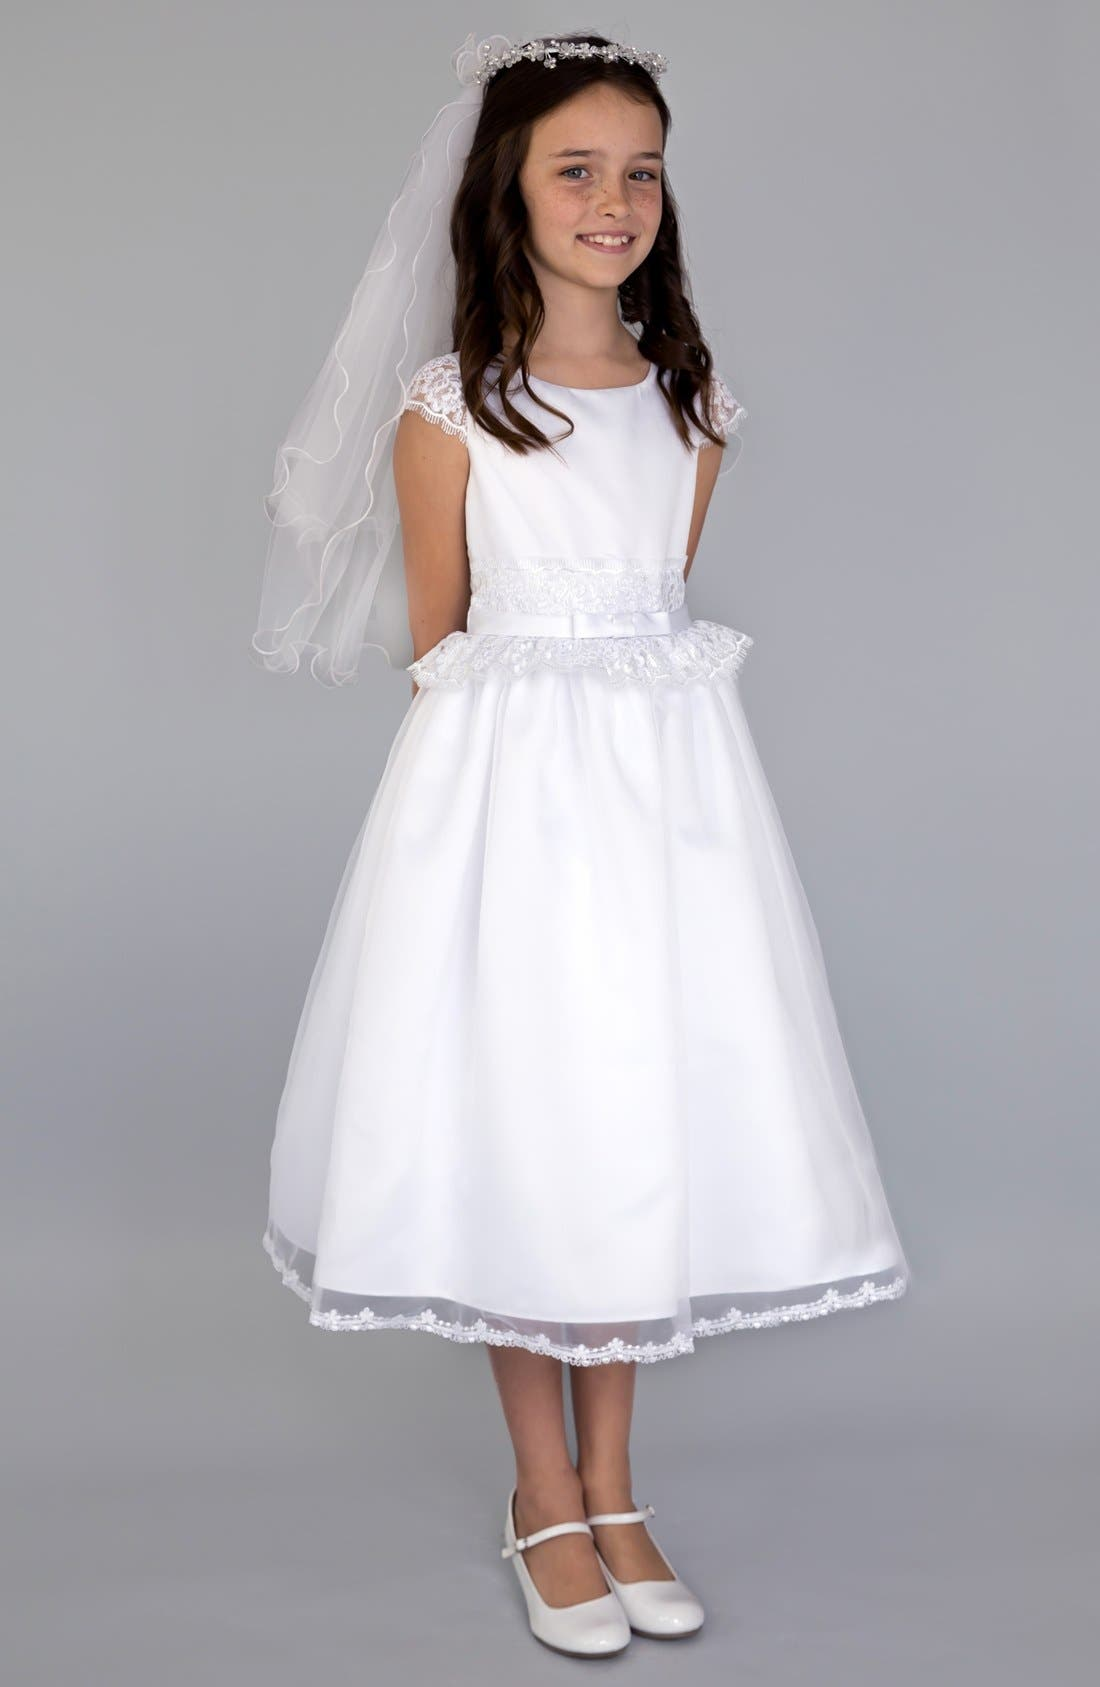 Lace Peplum Organza Dress,                             Main thumbnail 1, color,